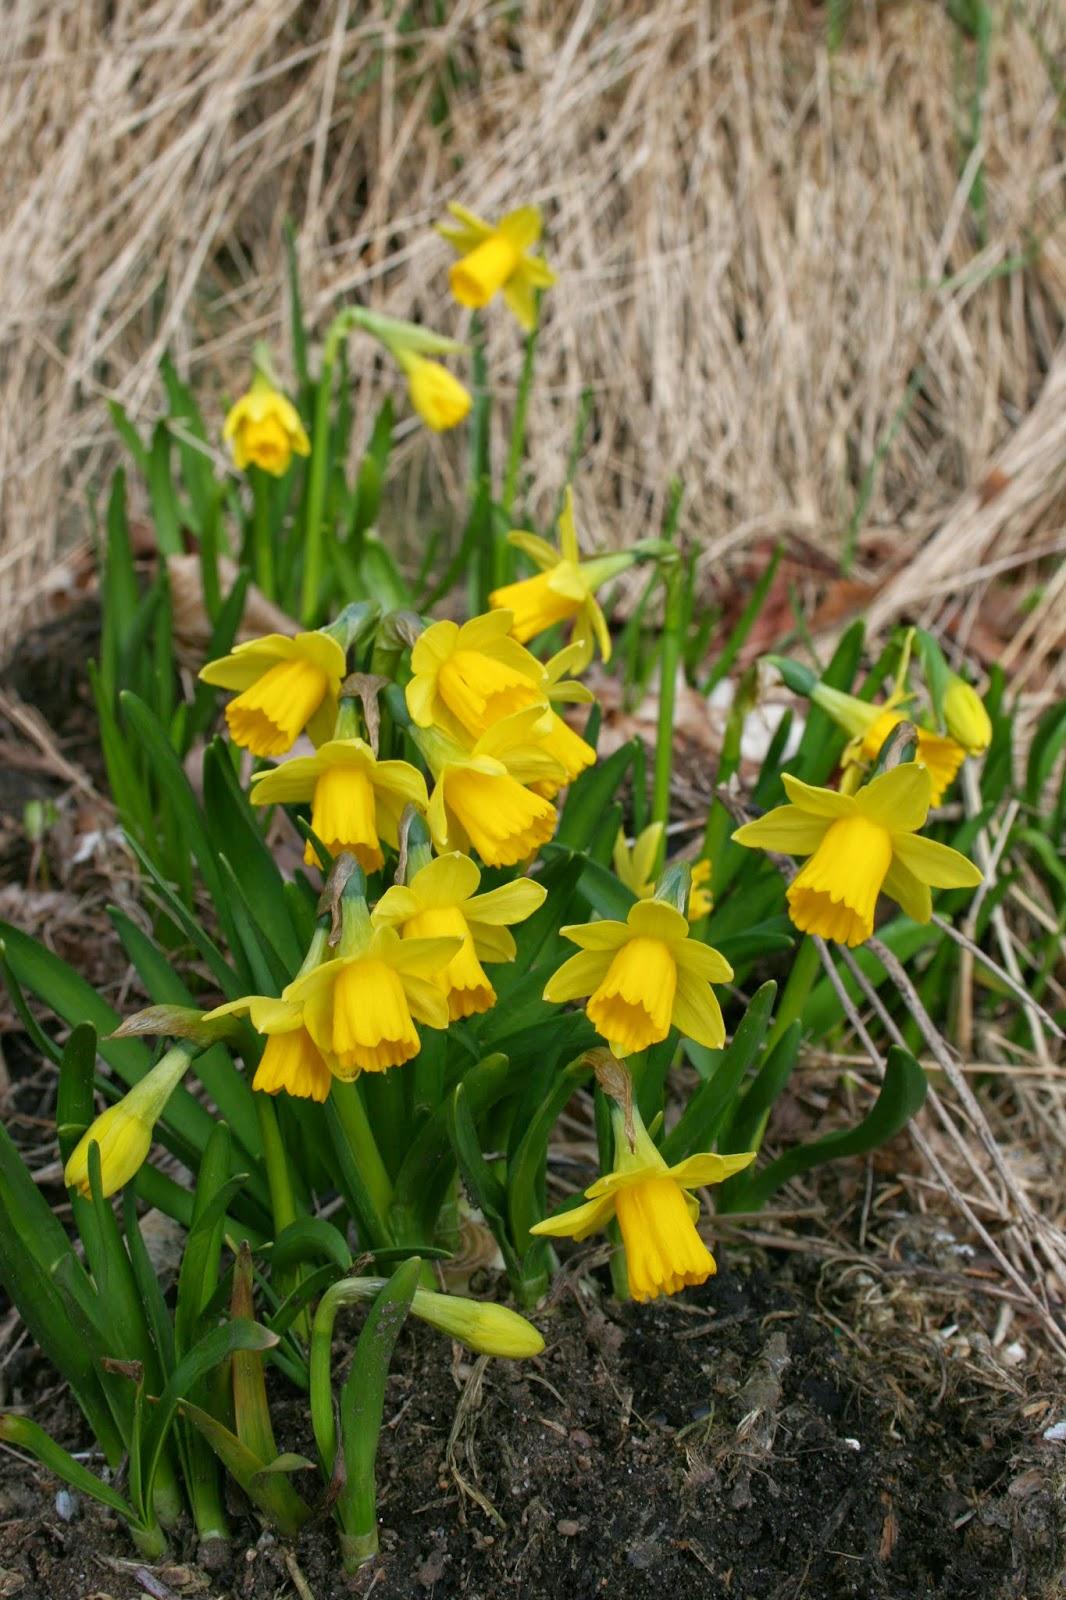 Minipåsklilja 'Tête-a-tête', Narcissus Cyclamineus